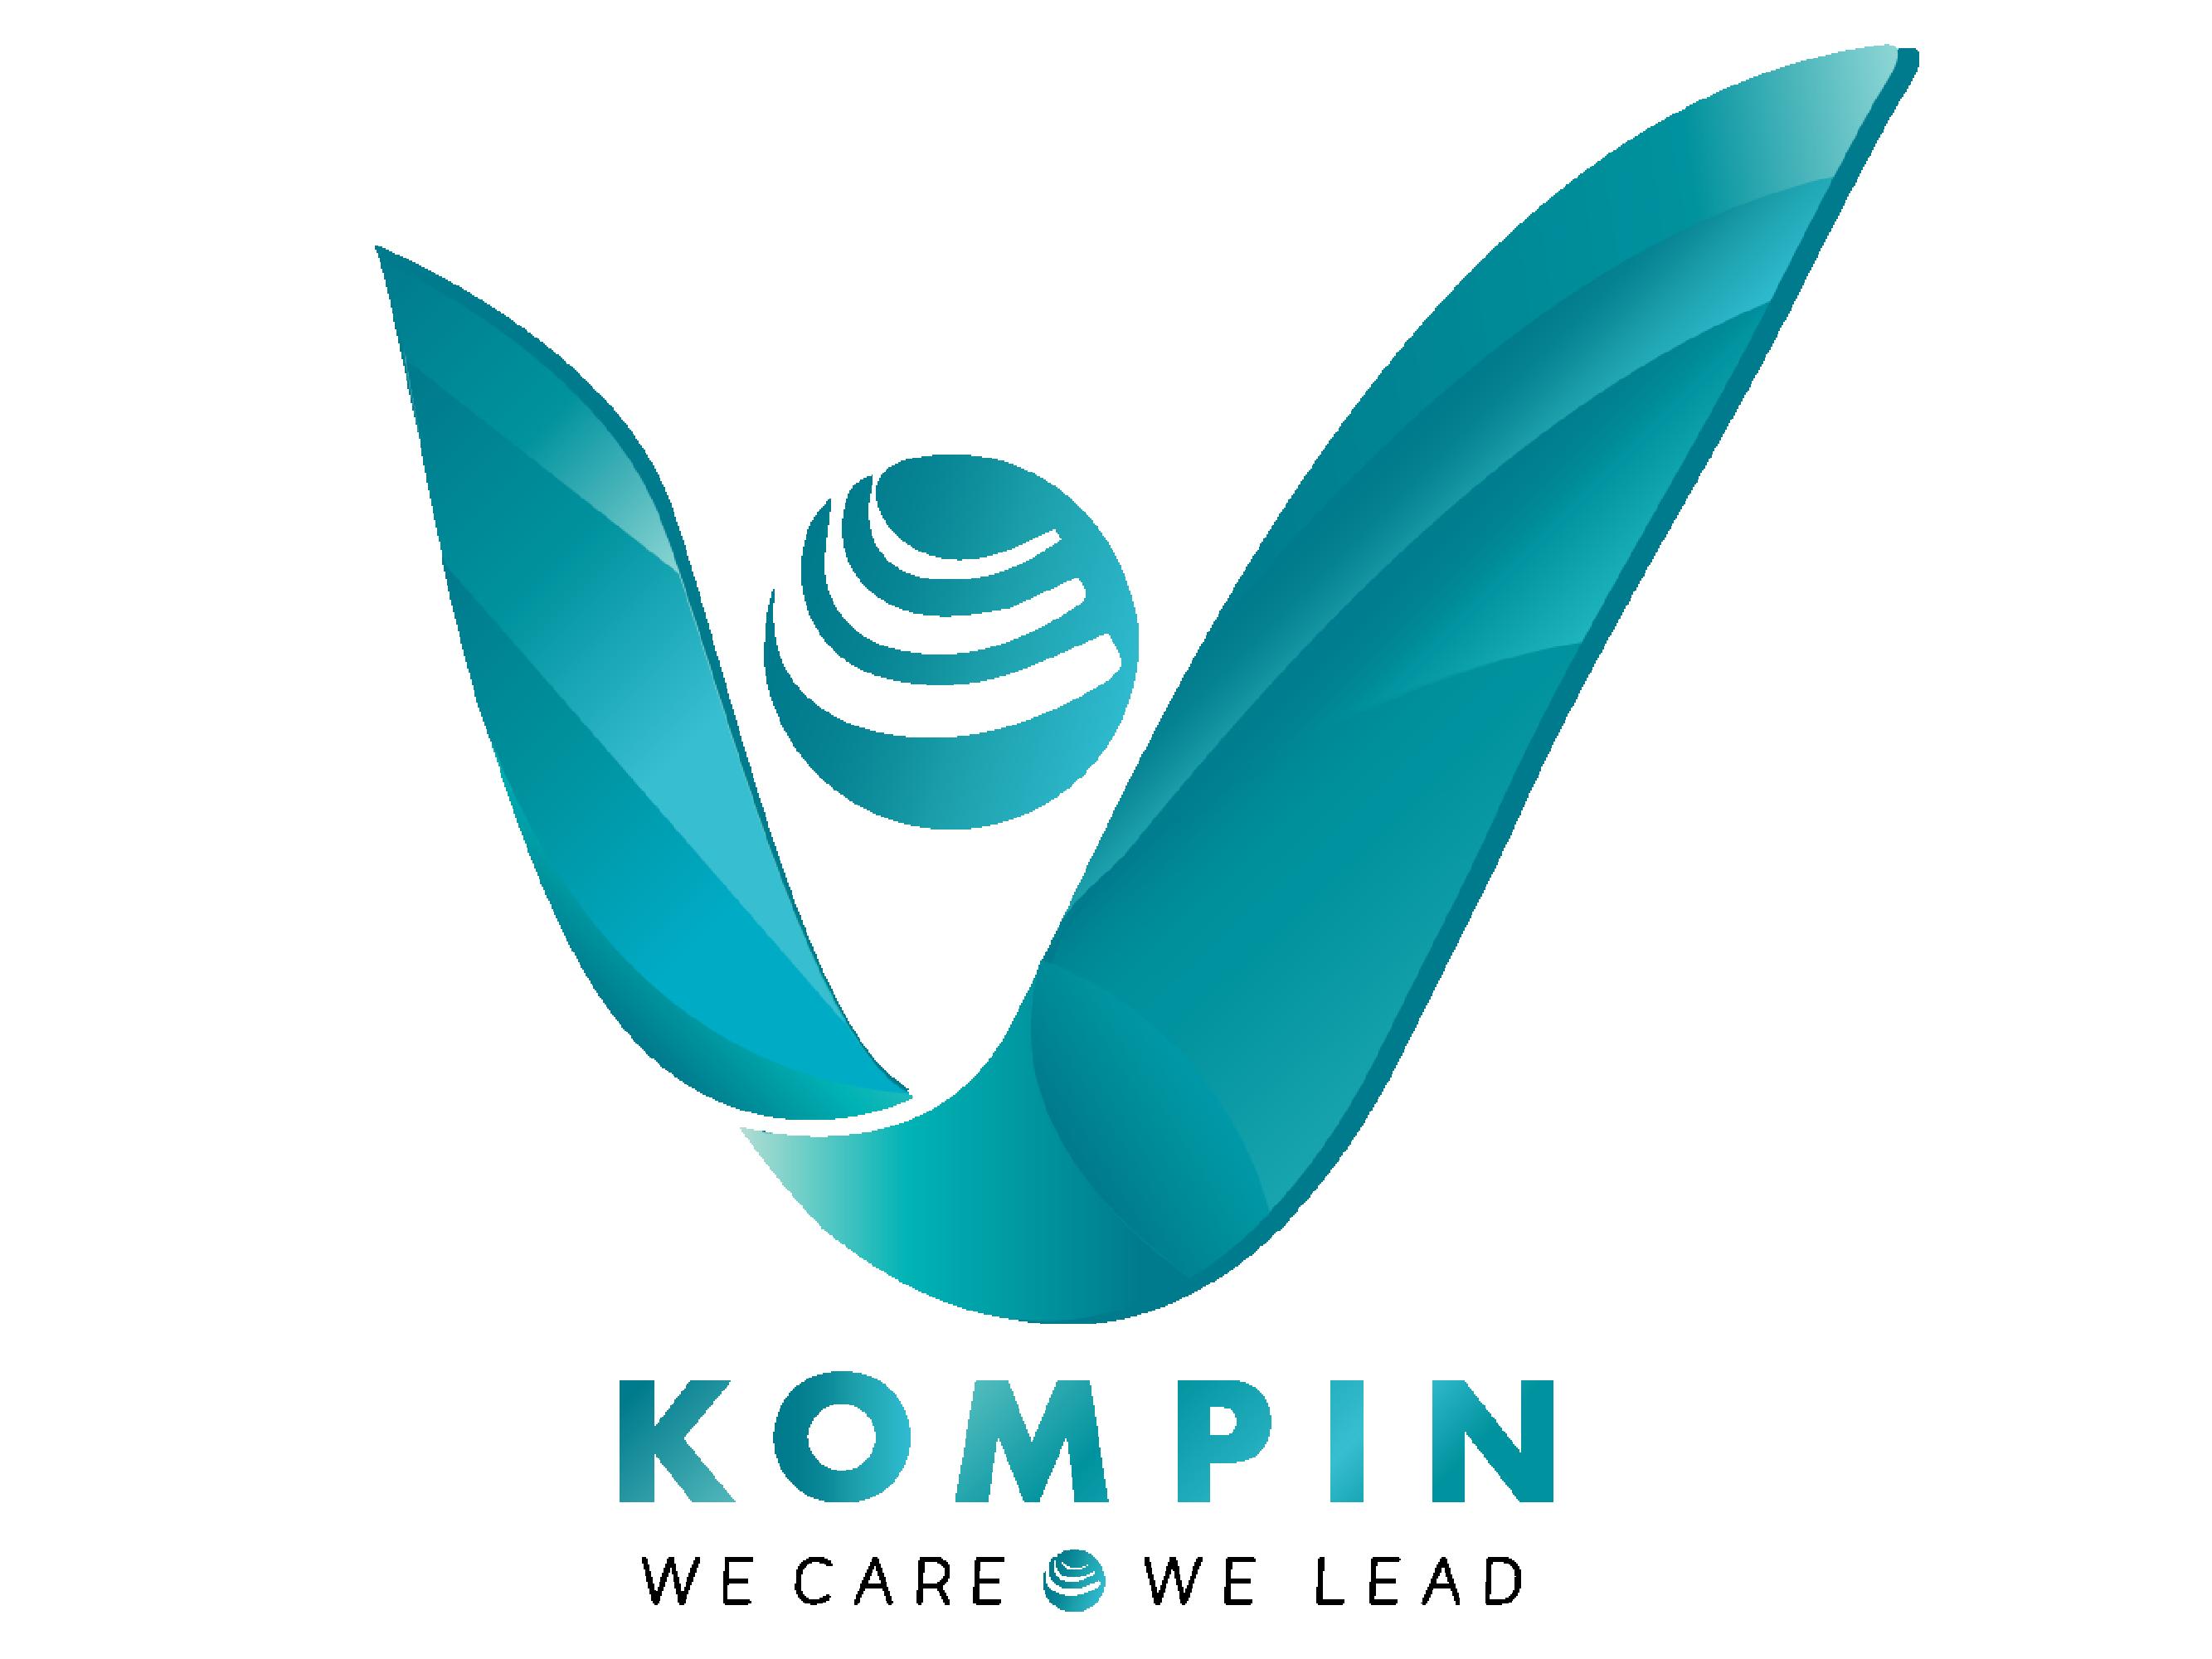 Logo-KOMPIN 640x480-01